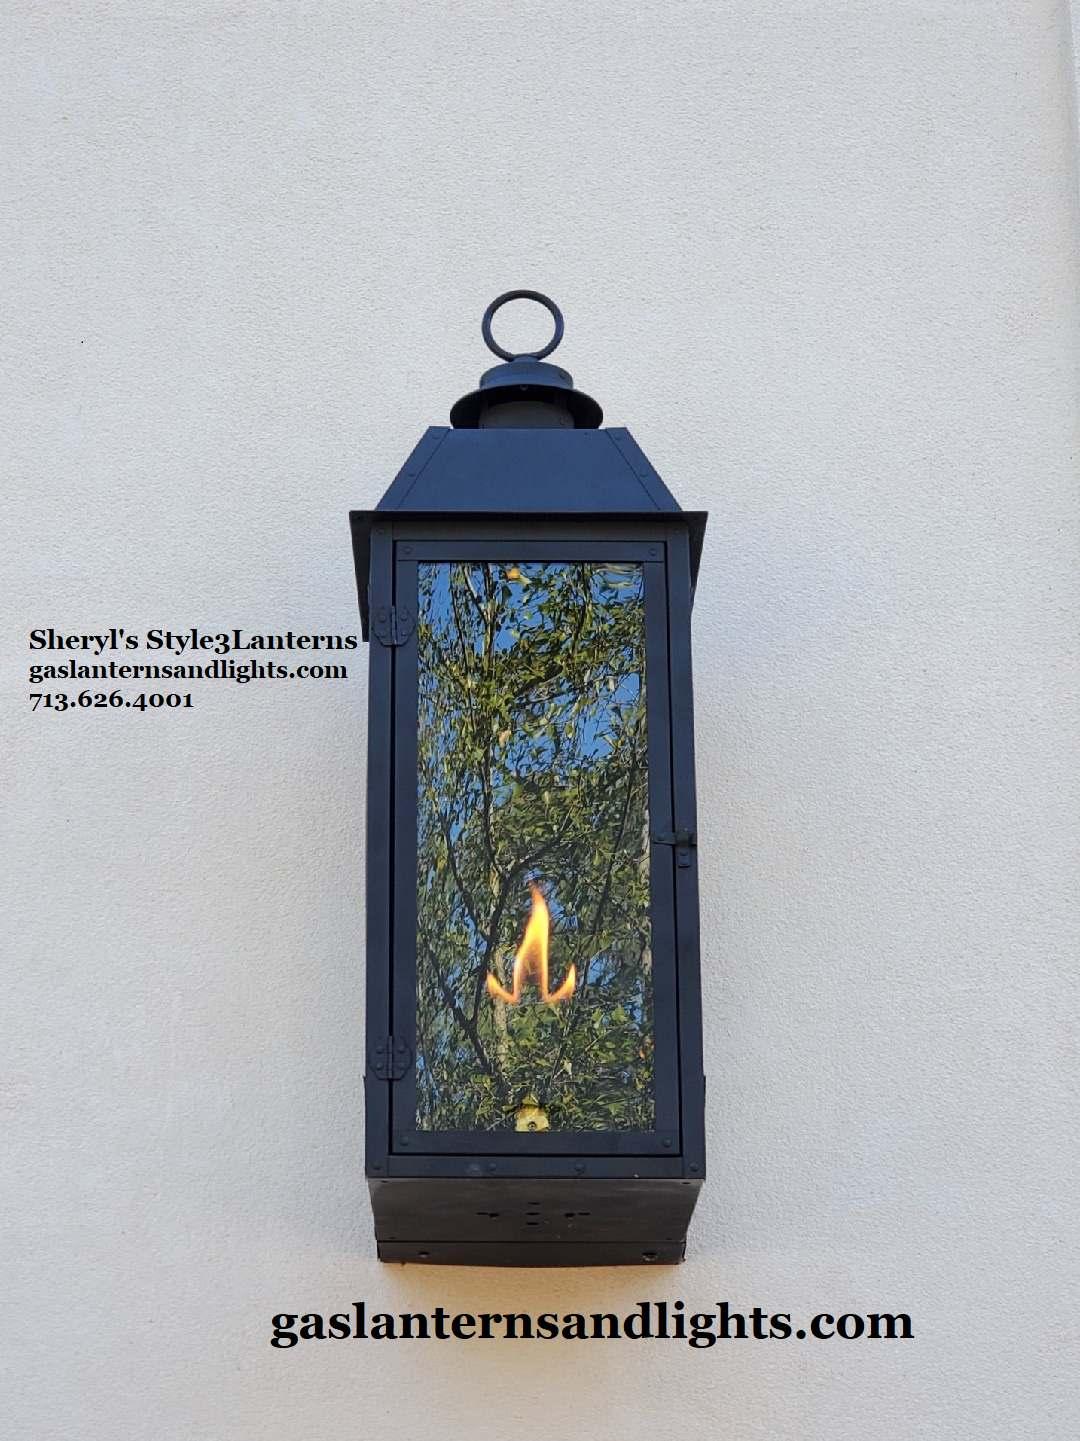 Sheryl's Style 3 Transitional Flush Mount Gas Lanterns